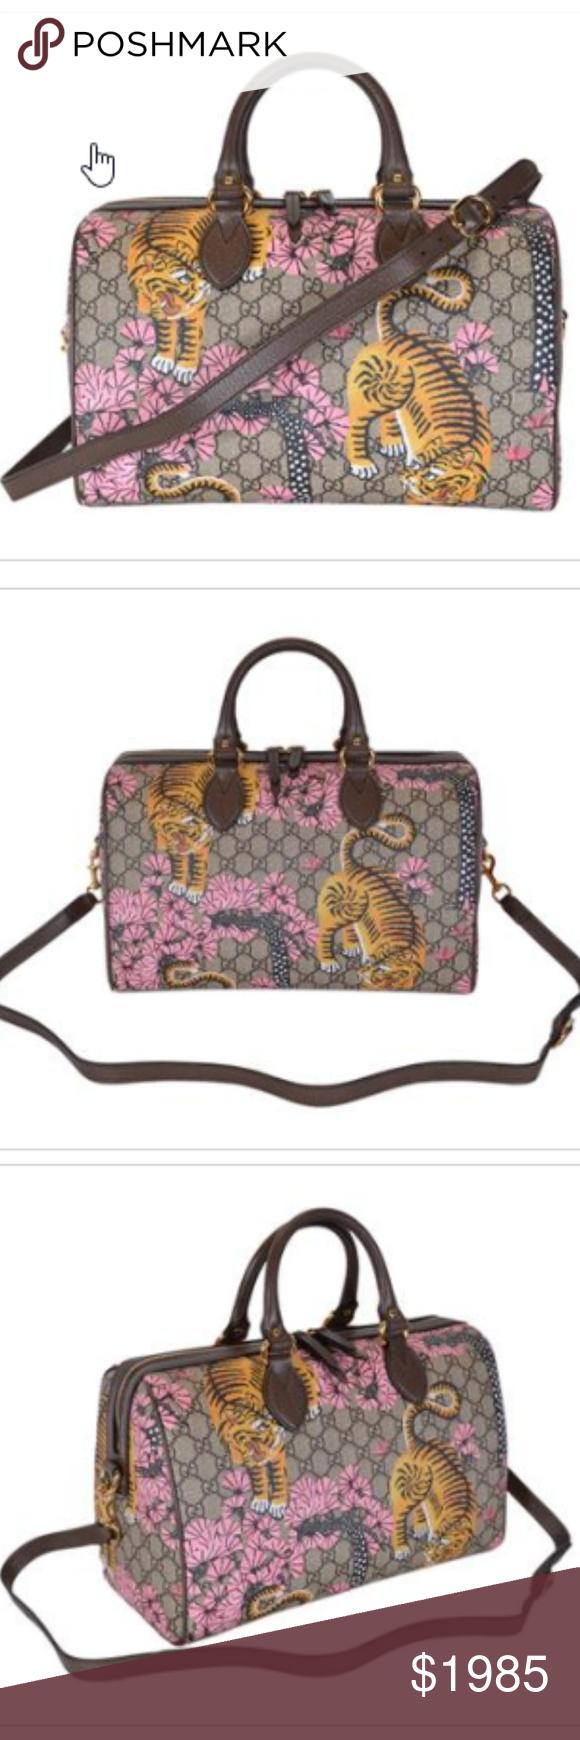 d6bd8739c79 New Gucci Women s GG Supreme Bengal Boston Purse New in Gucci Bengal Tiger  Box Style 409527